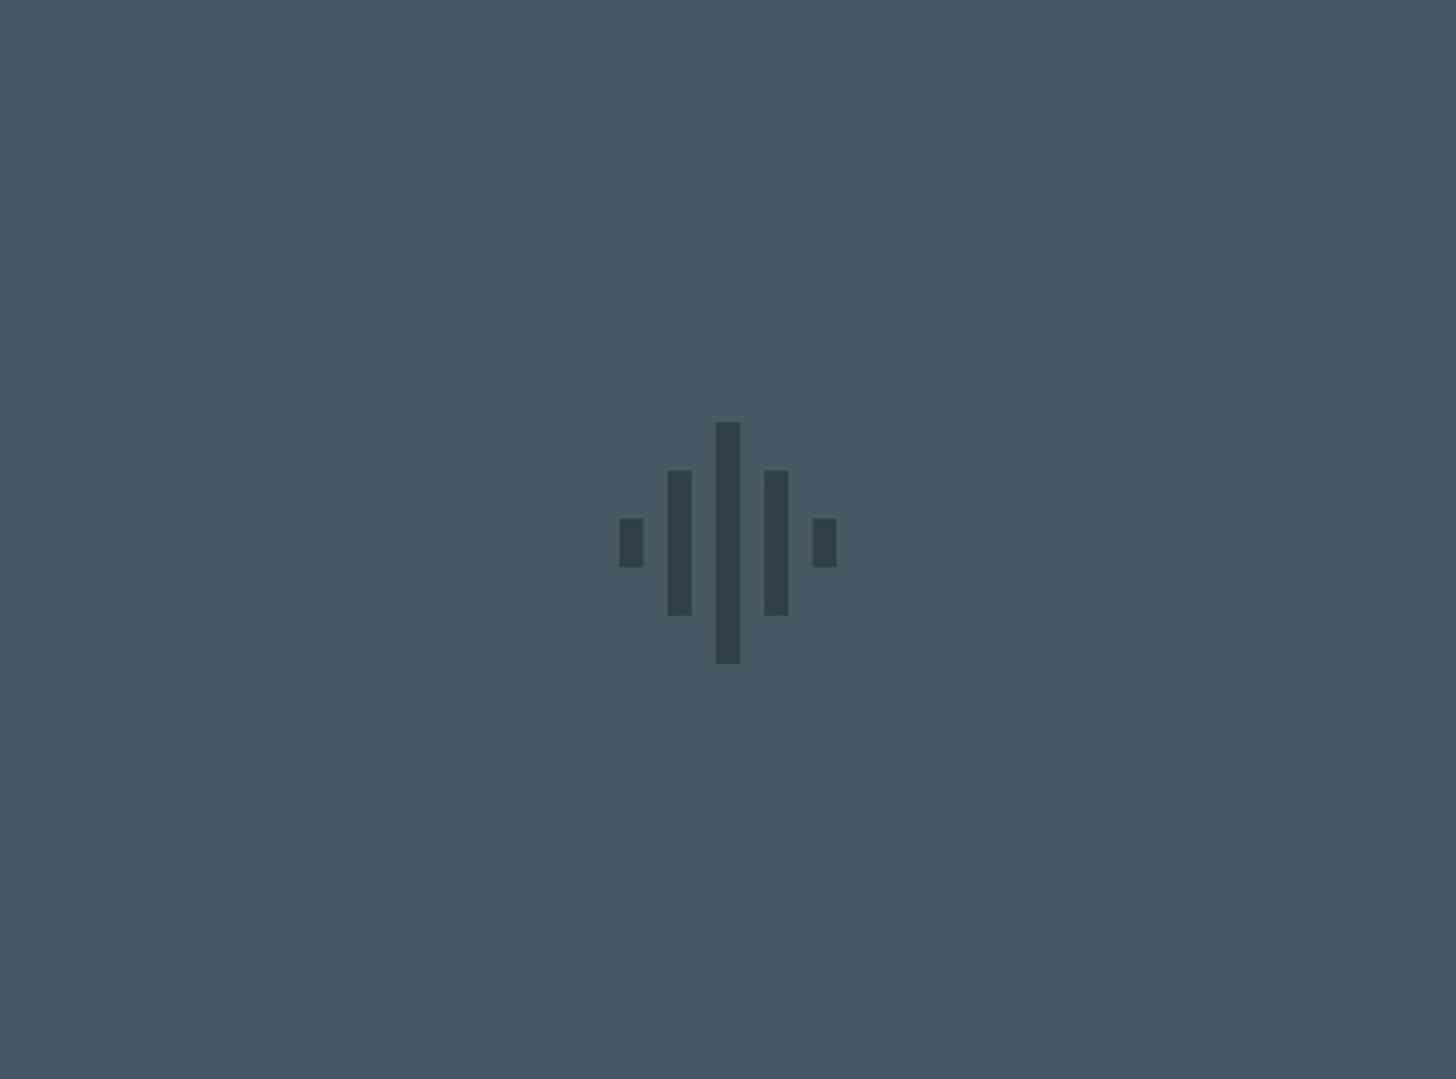 Google Voice Access I/O 2015